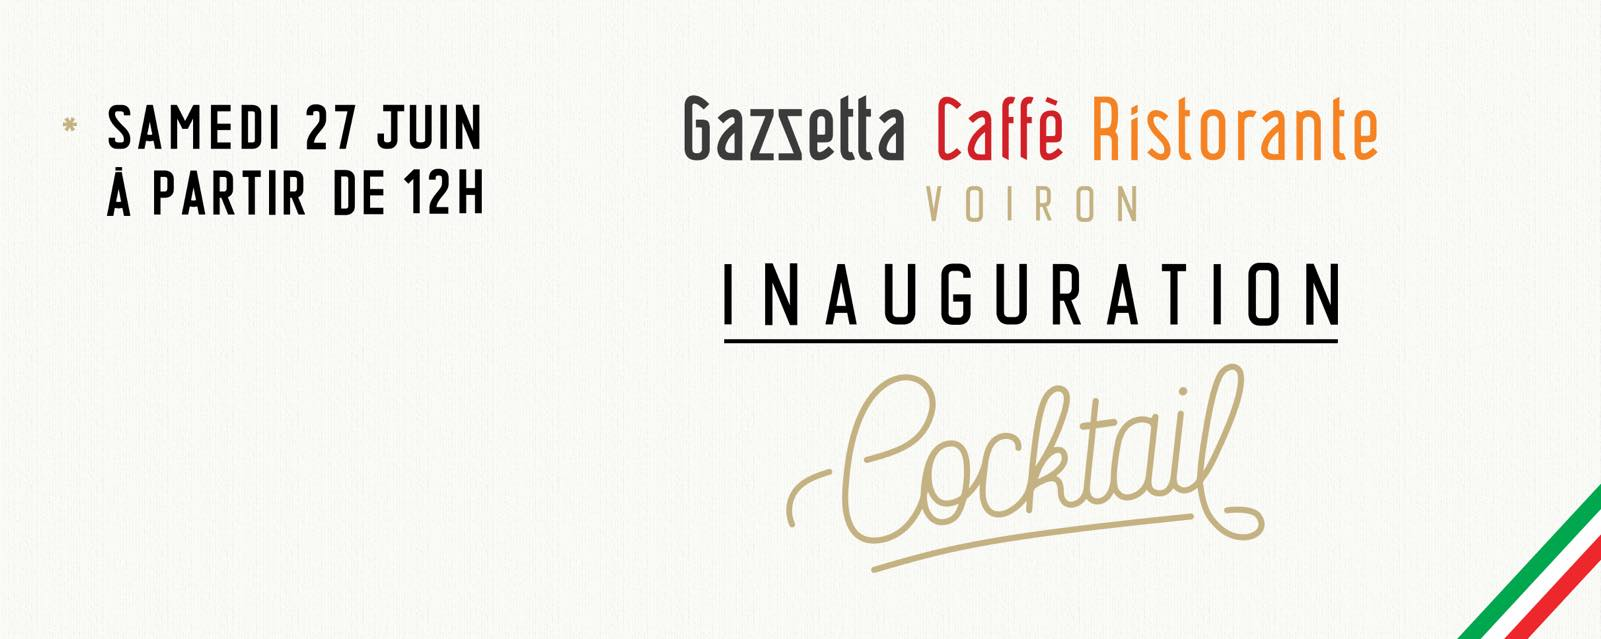 Gazzetta Caffe Ristorante Voiron